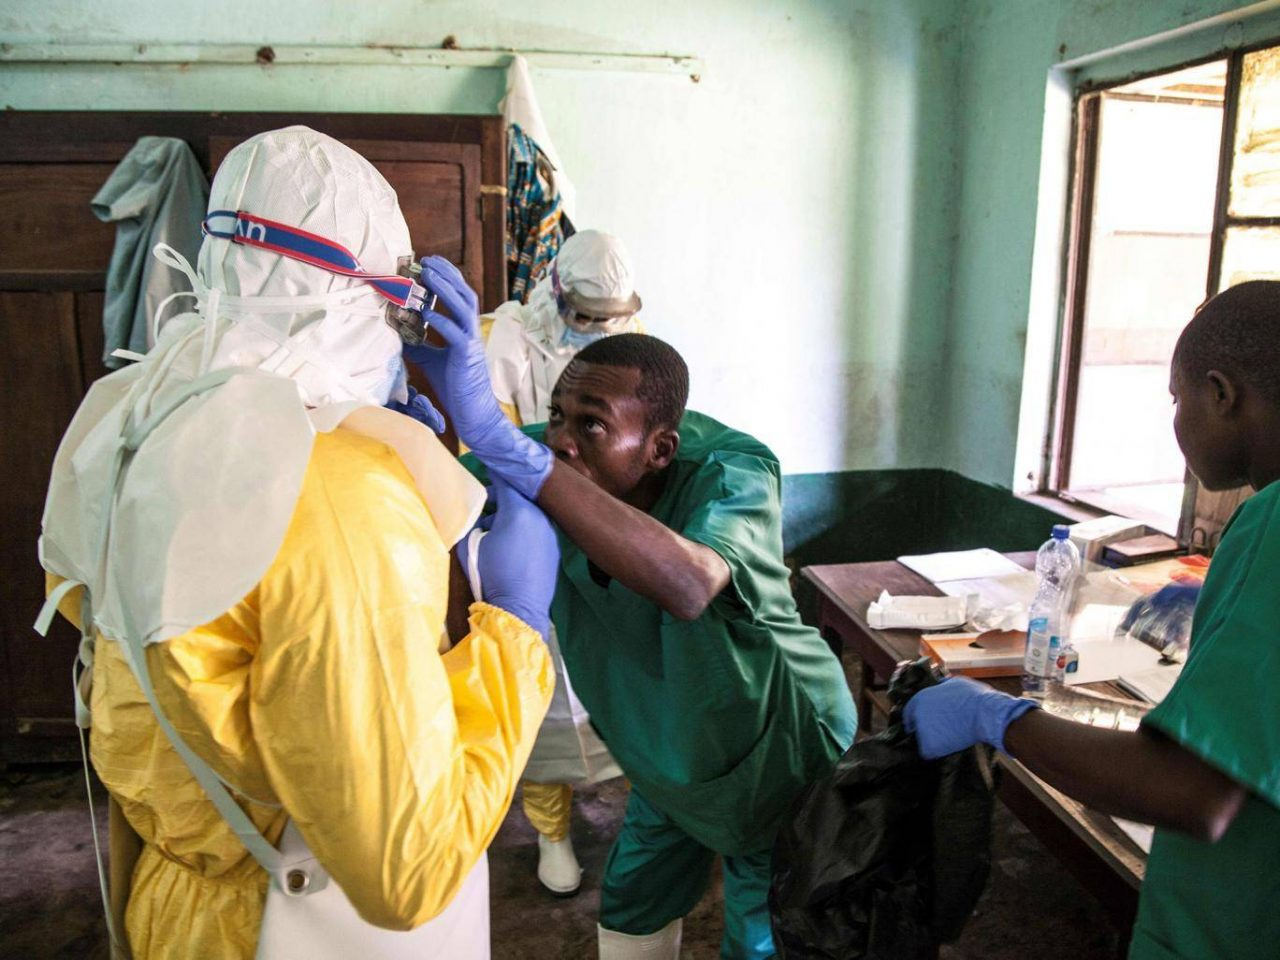 ebola-congo-1280x960.jpg